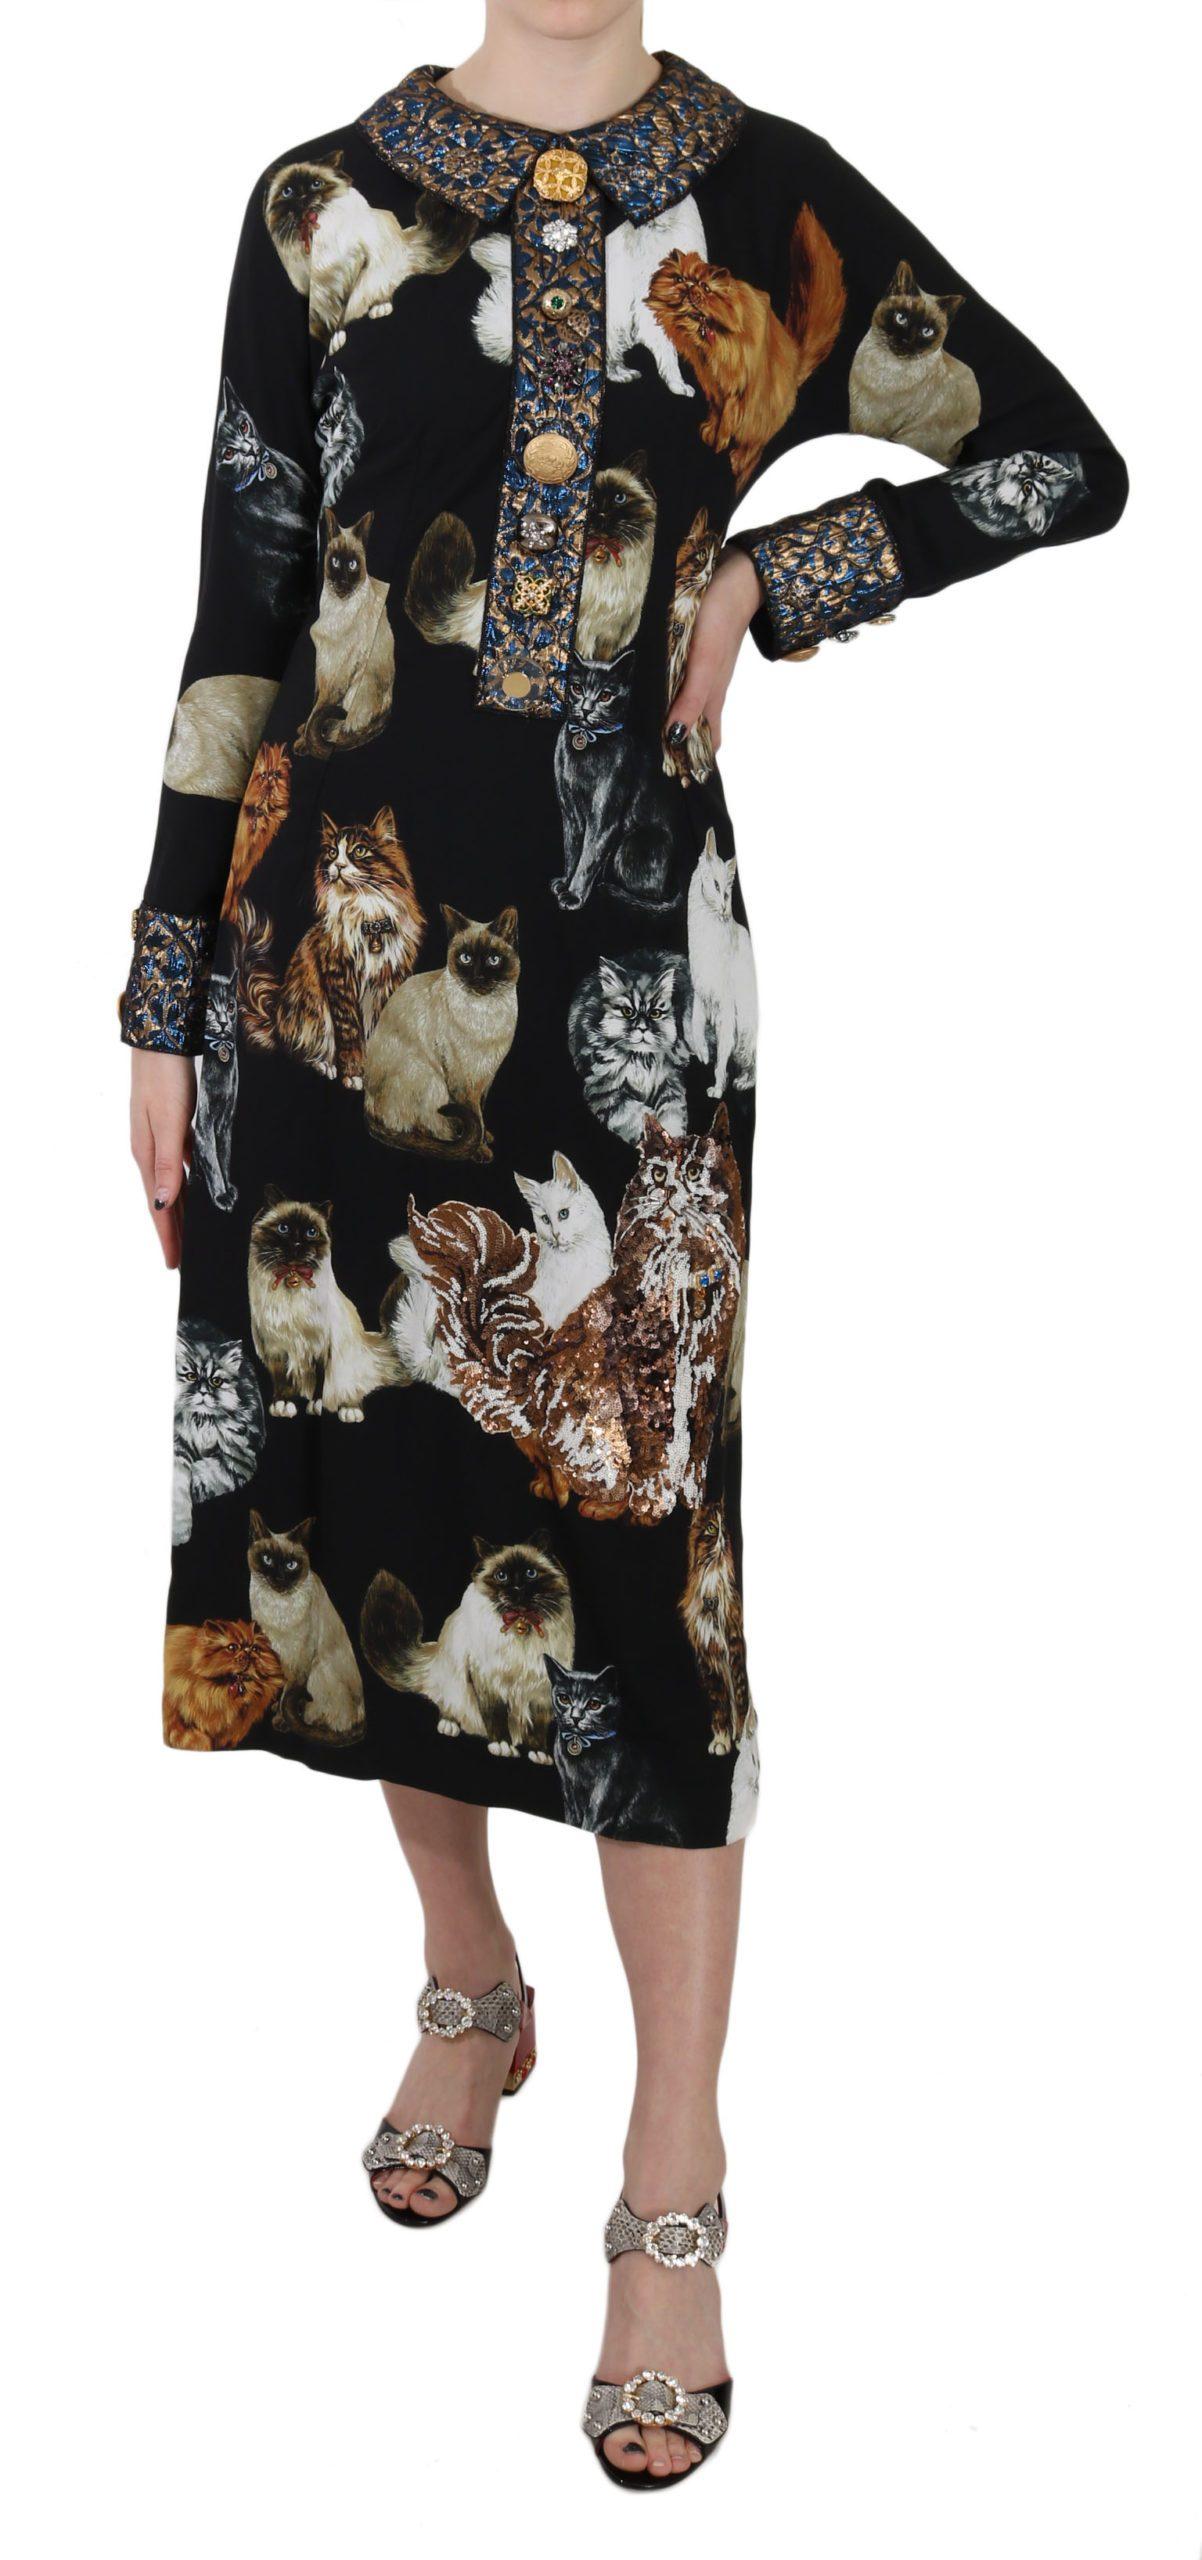 Dolce & Gabbana Women's Bengal Cat Crystal Jacquard Dress Black DR1661 - IT42|M